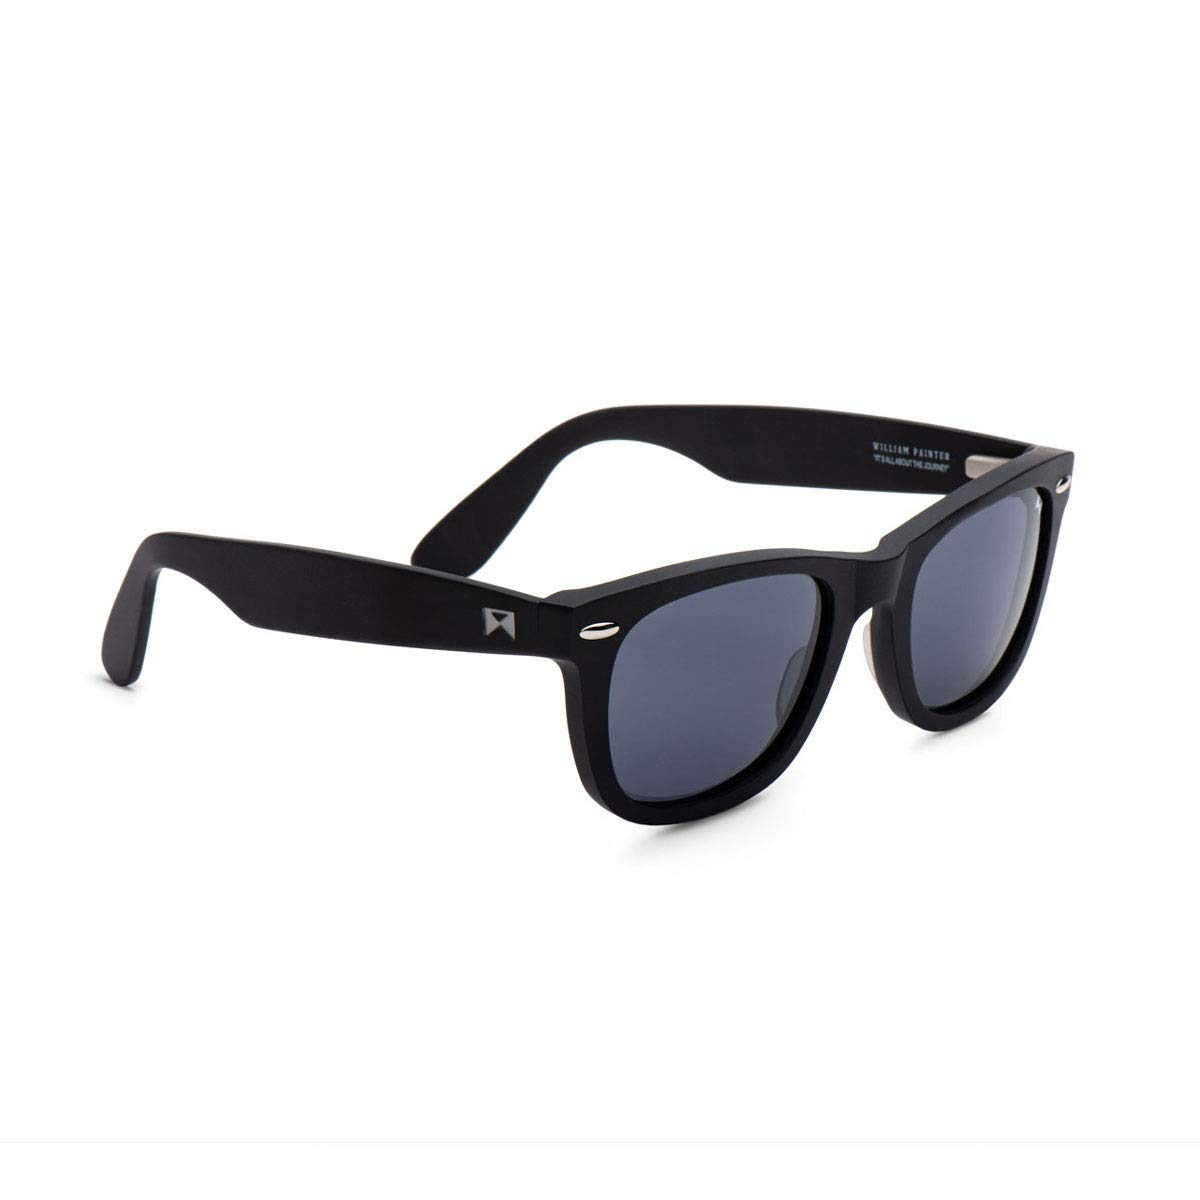 William Painter - The Sloan 'Classic' Sunglasses.